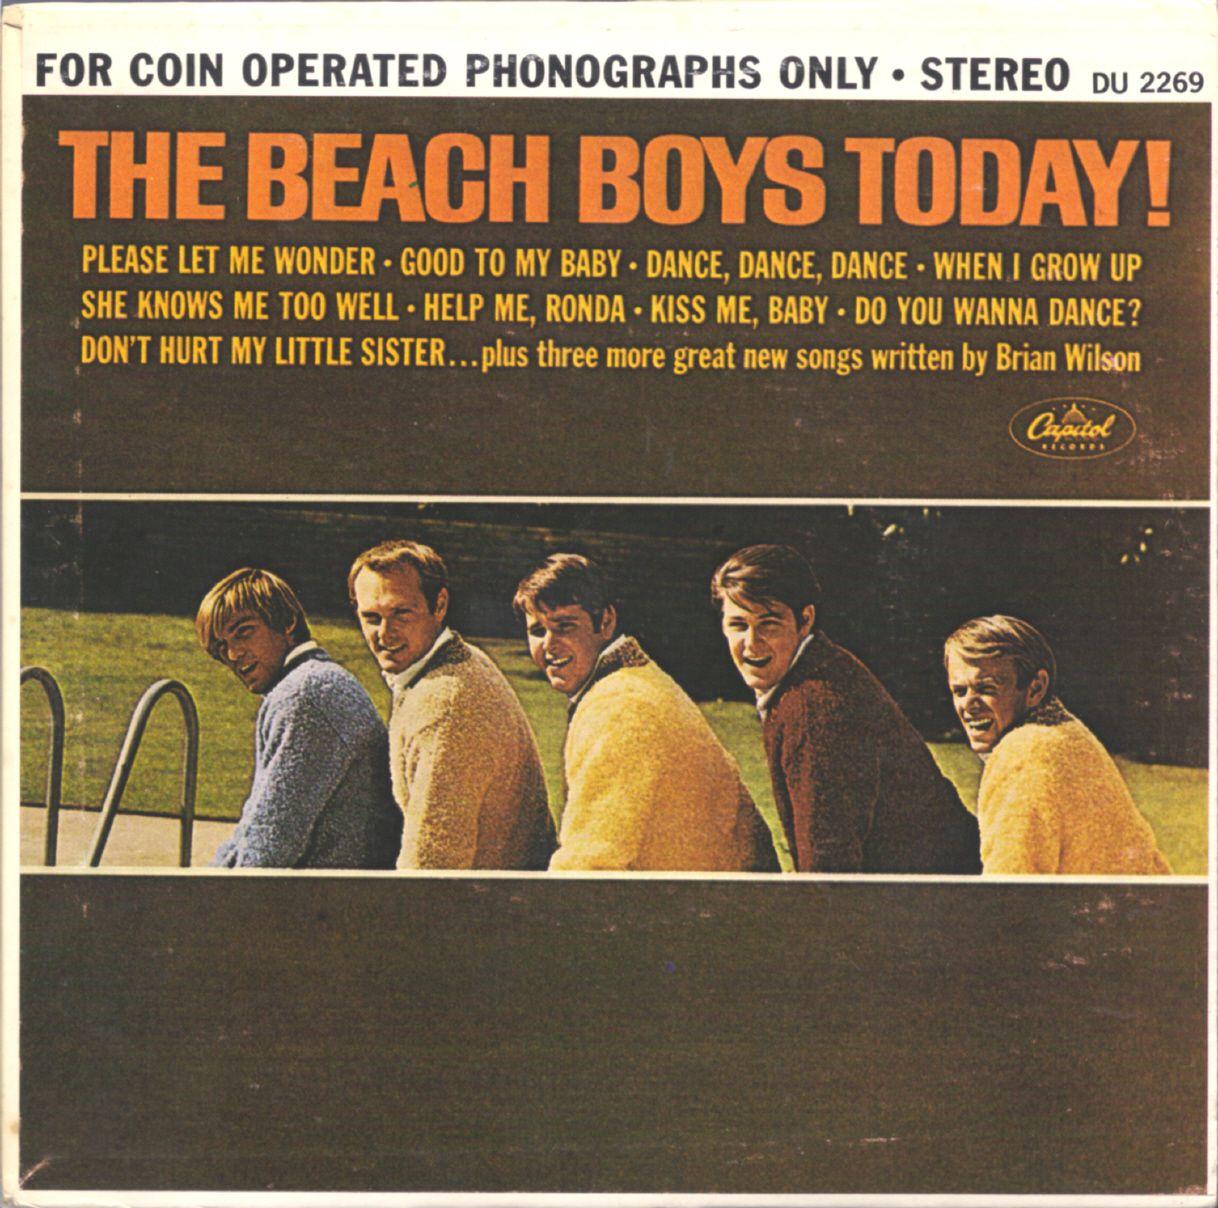 the beach boys the beach boys today 1965 vinyl pinterest jukebox and brian wilson. Black Bedroom Furniture Sets. Home Design Ideas